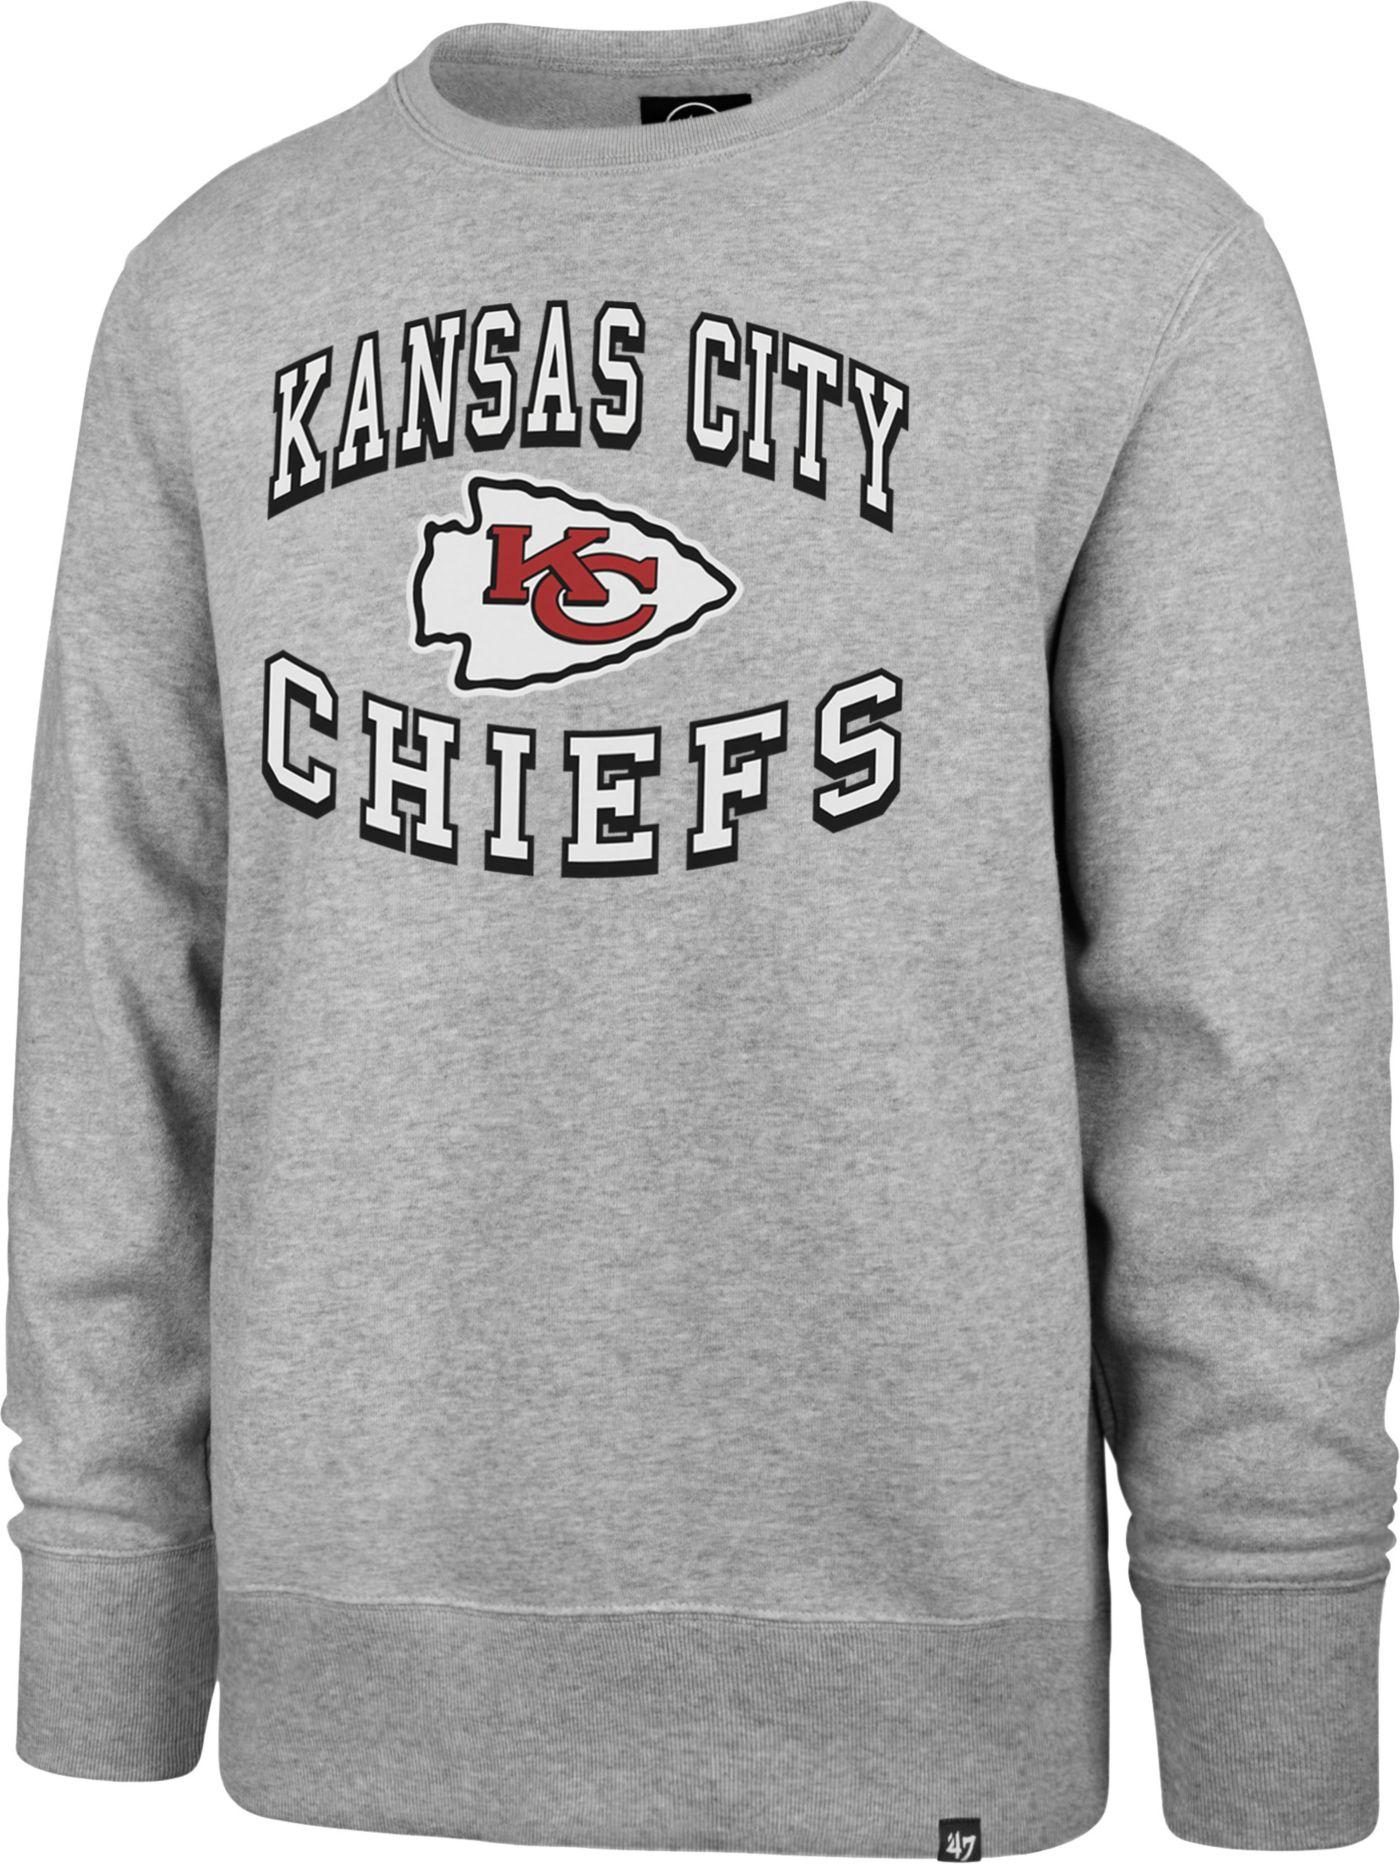 '47 Men's Kansas City Chiefs Headline Grey Crew